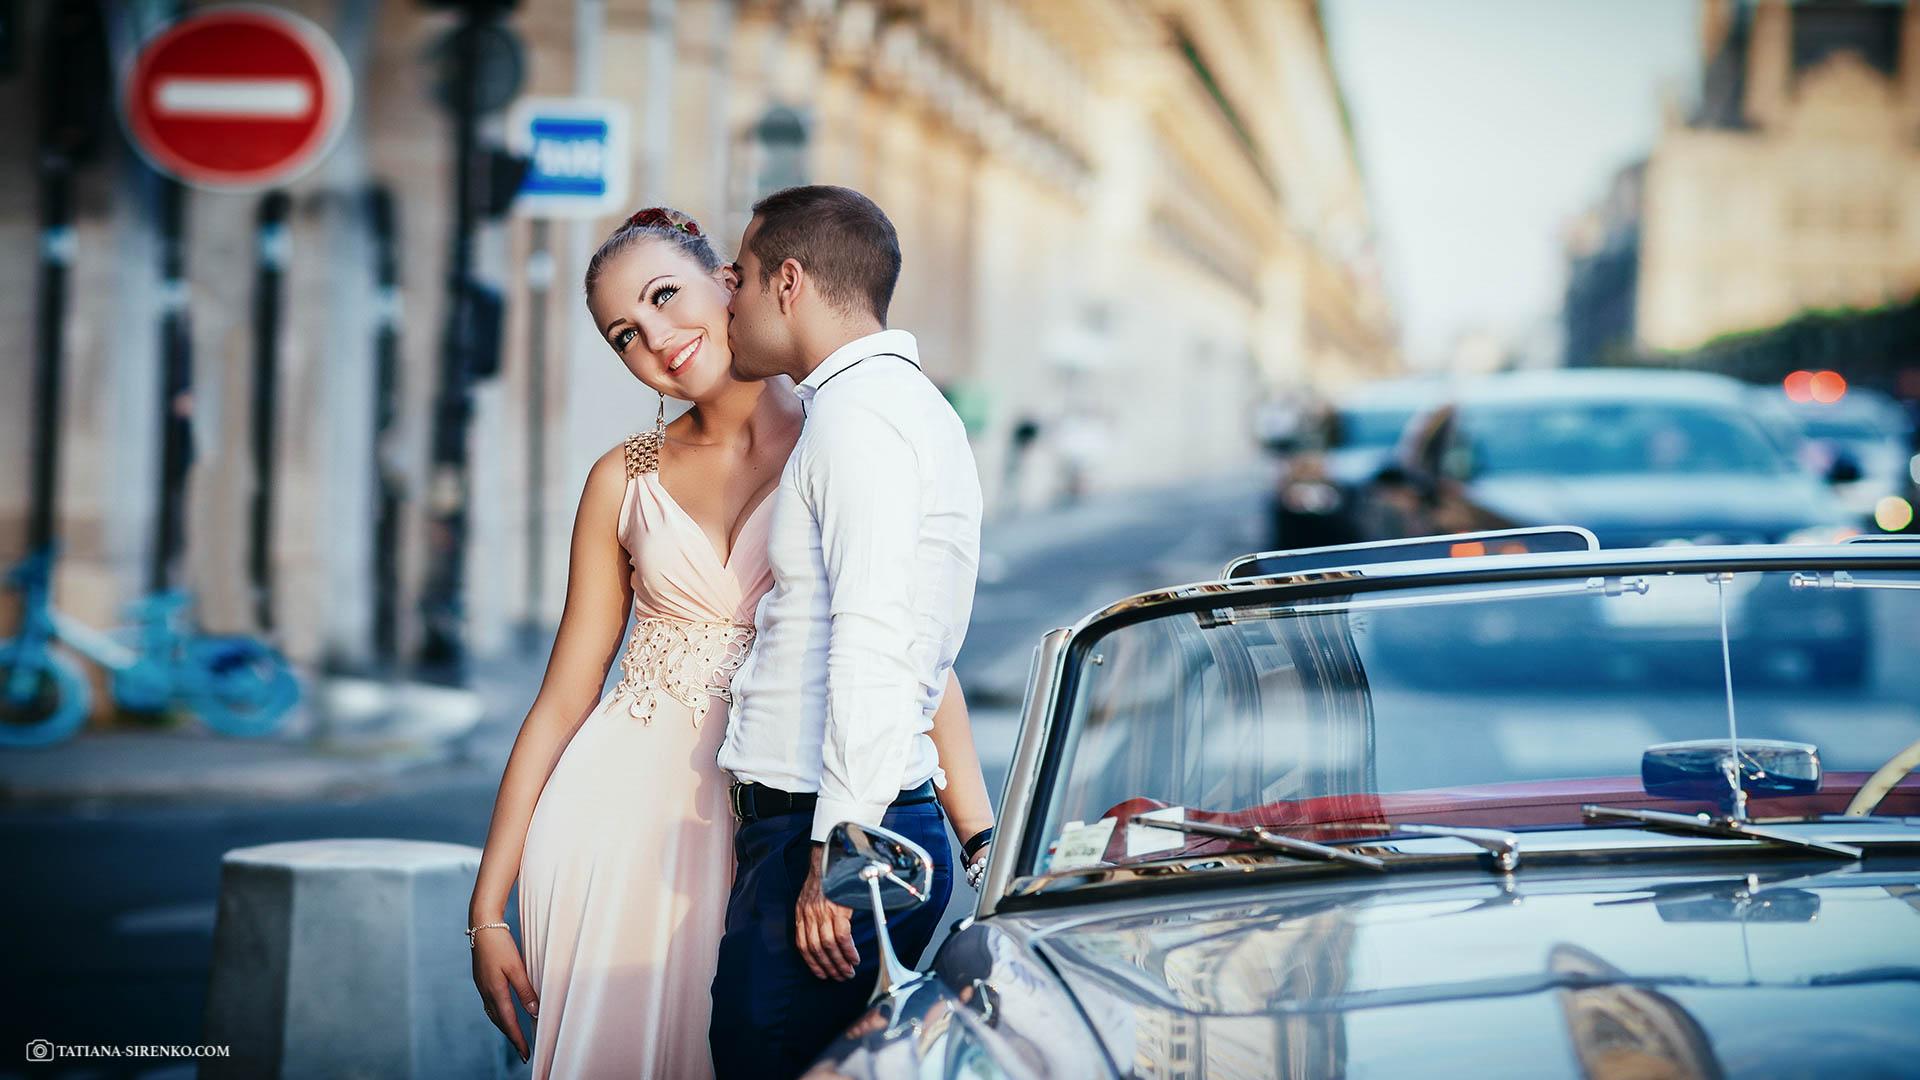 Wedding photography in Switzerland